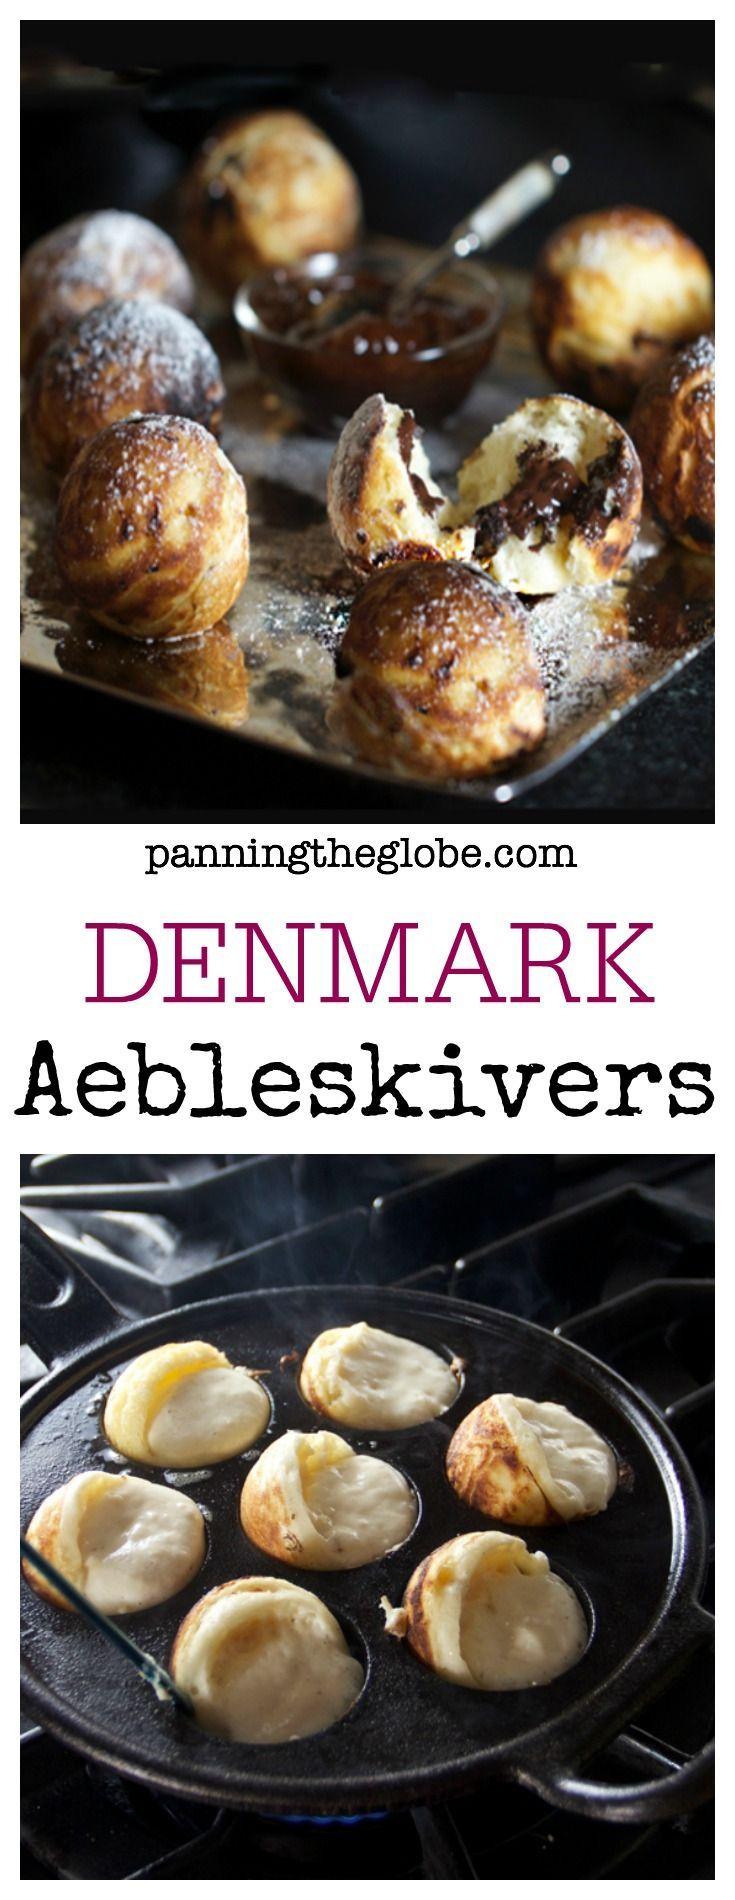 Danish Aebleskiver Recipe Aebleskiver recipe